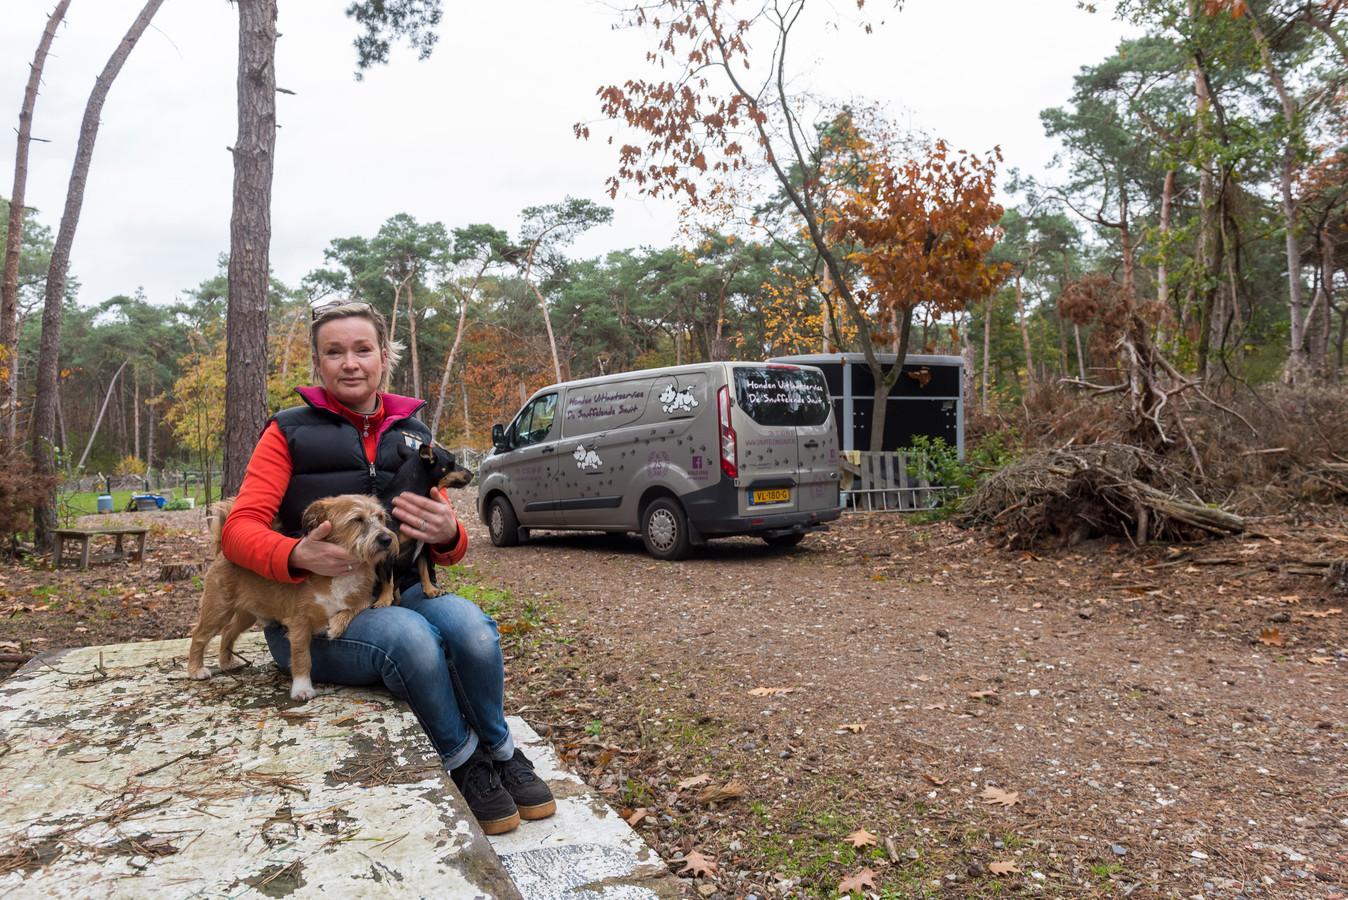 Eigenaresse Maeyke Alons van Hondenuitlaatservice De Snuffelende Snuit op haar bosperceel in het buitengebied van Gerwen.